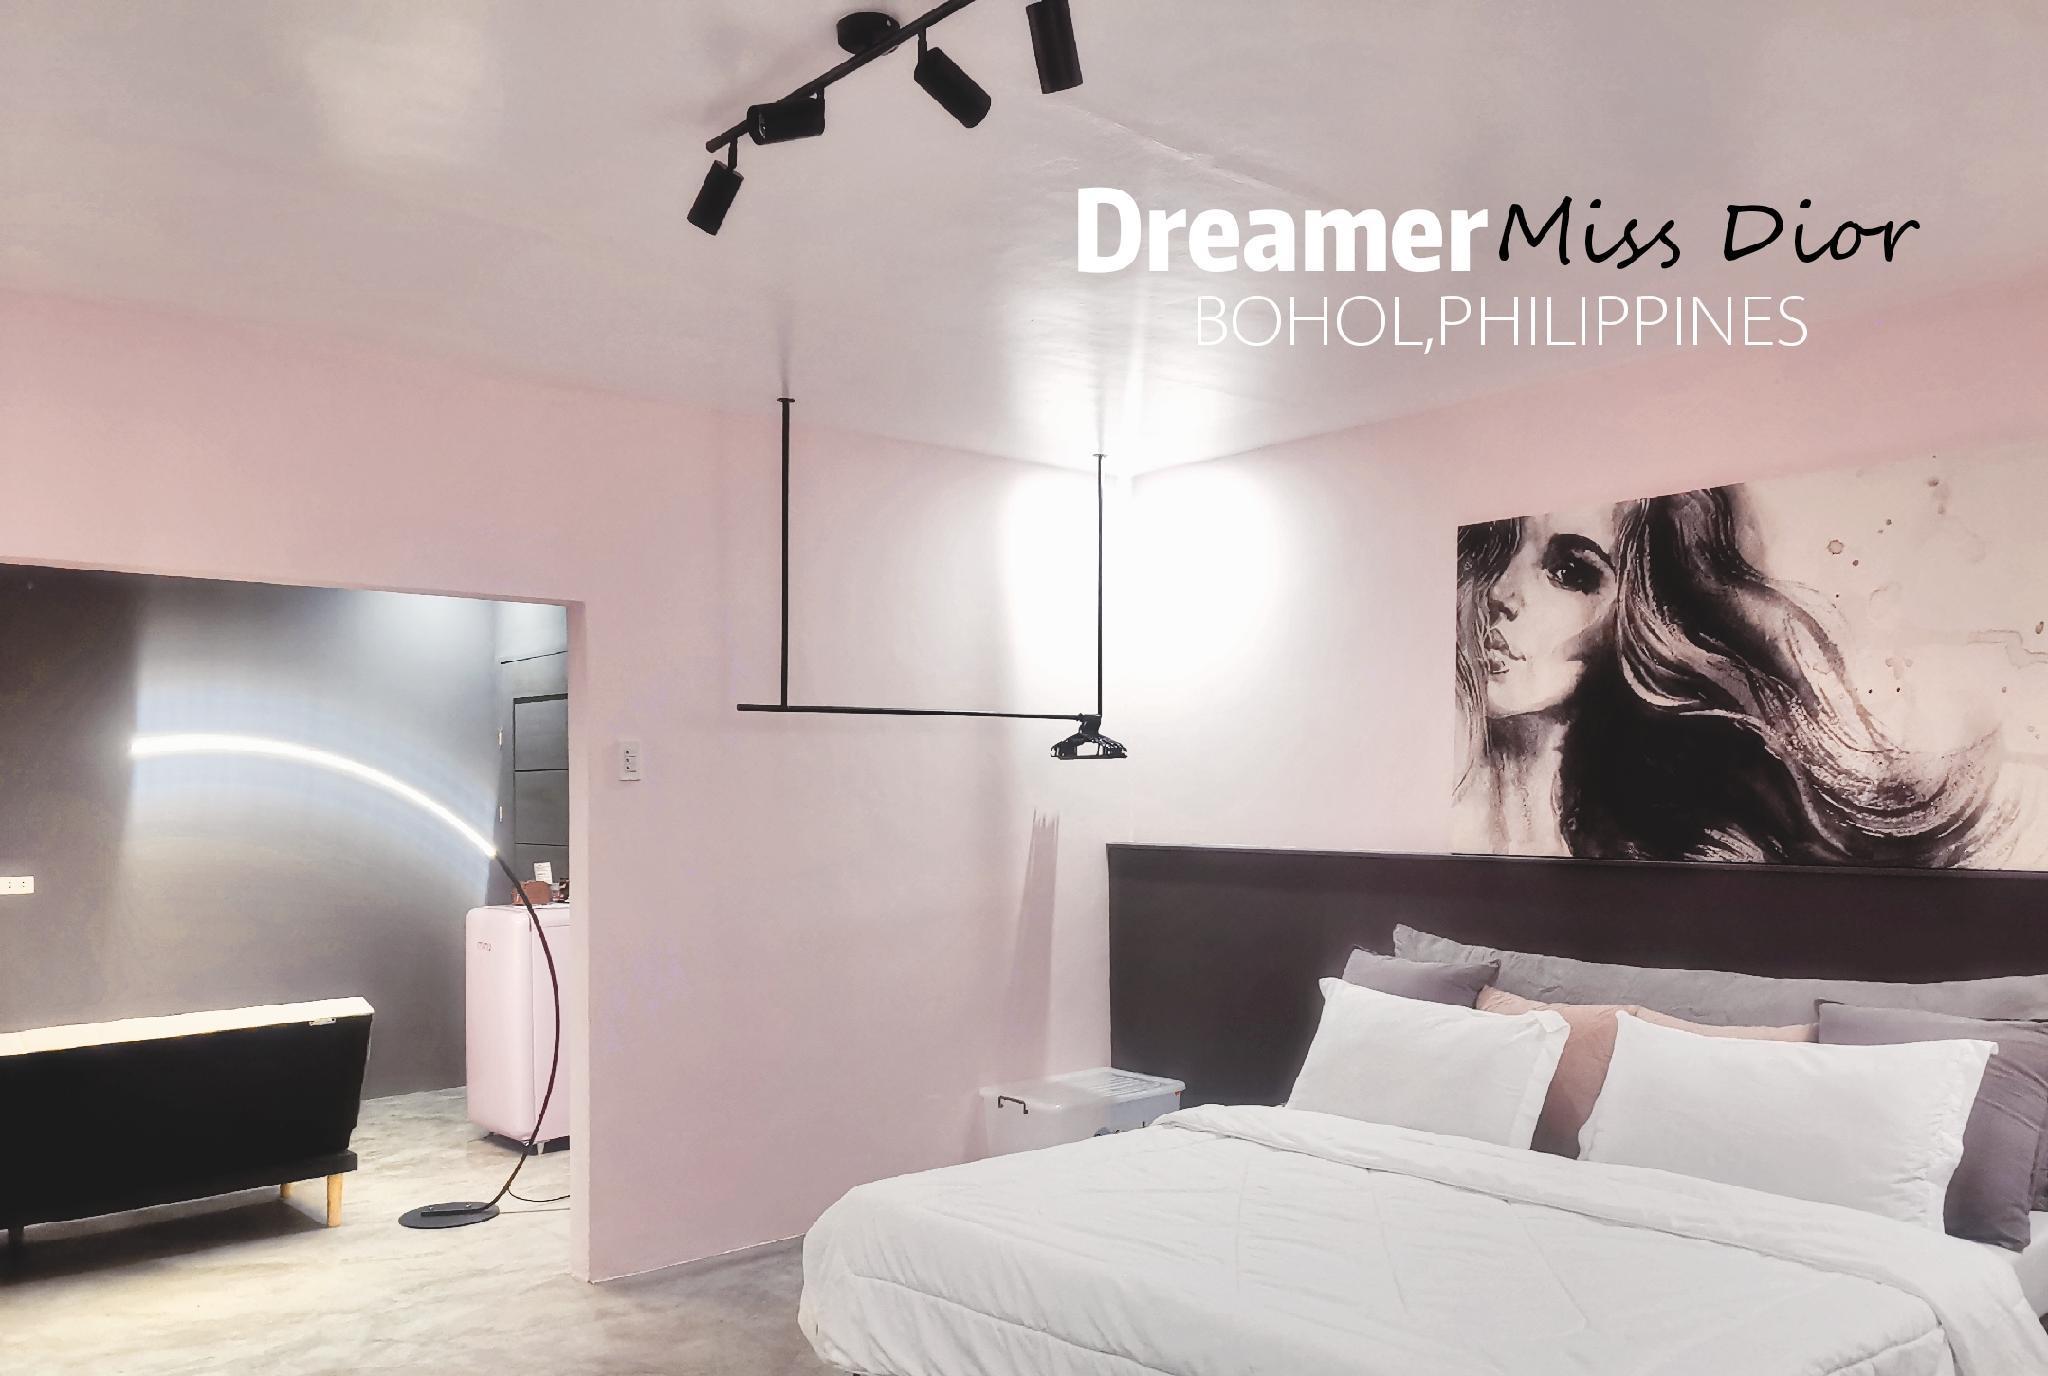 Dreamer. MissDior